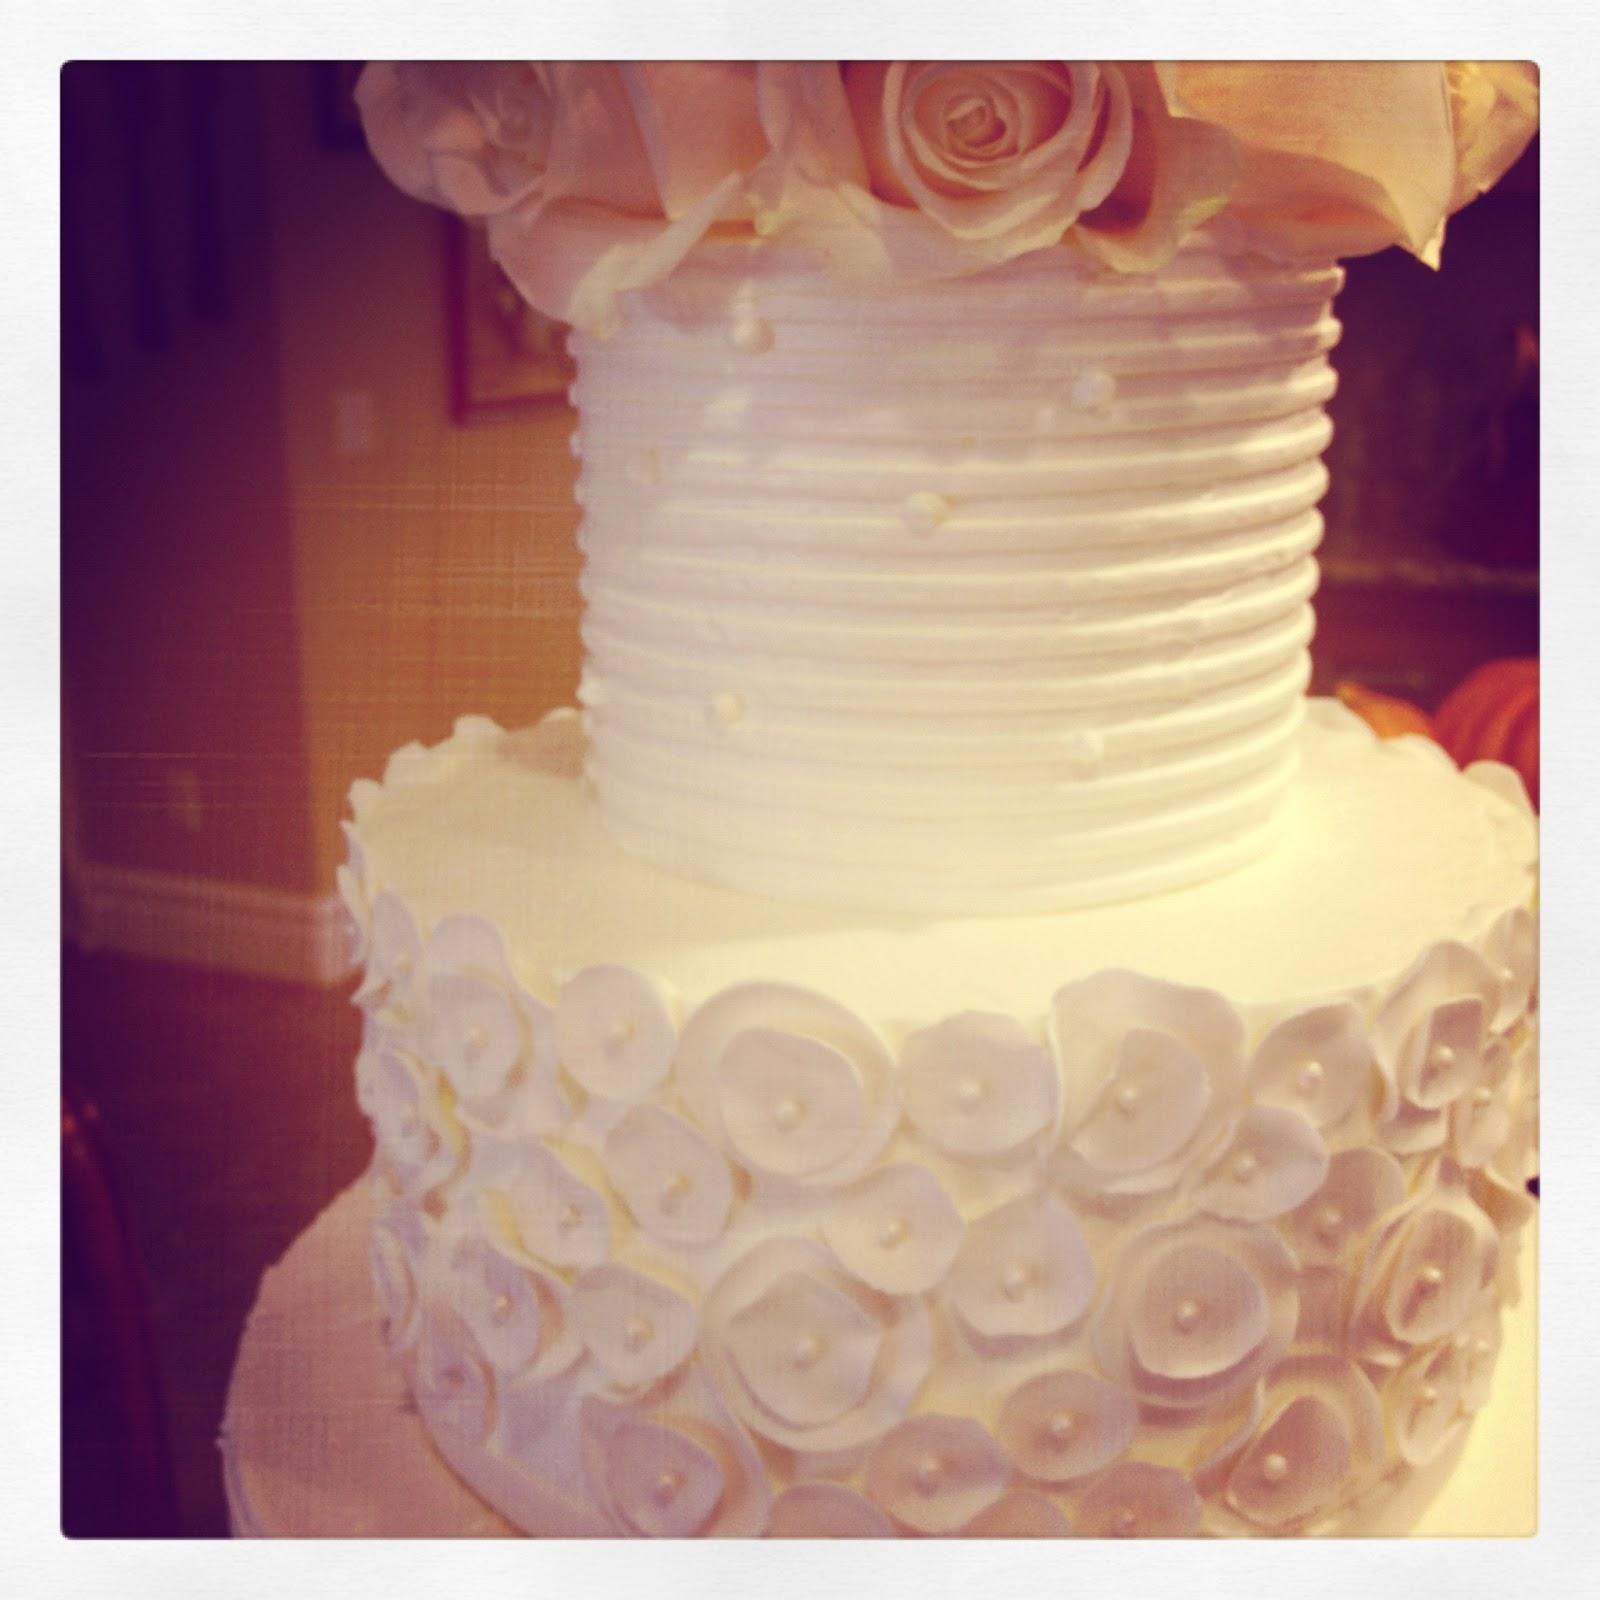 white buttercream wedding cake with white roses | BAKESHOPmarie